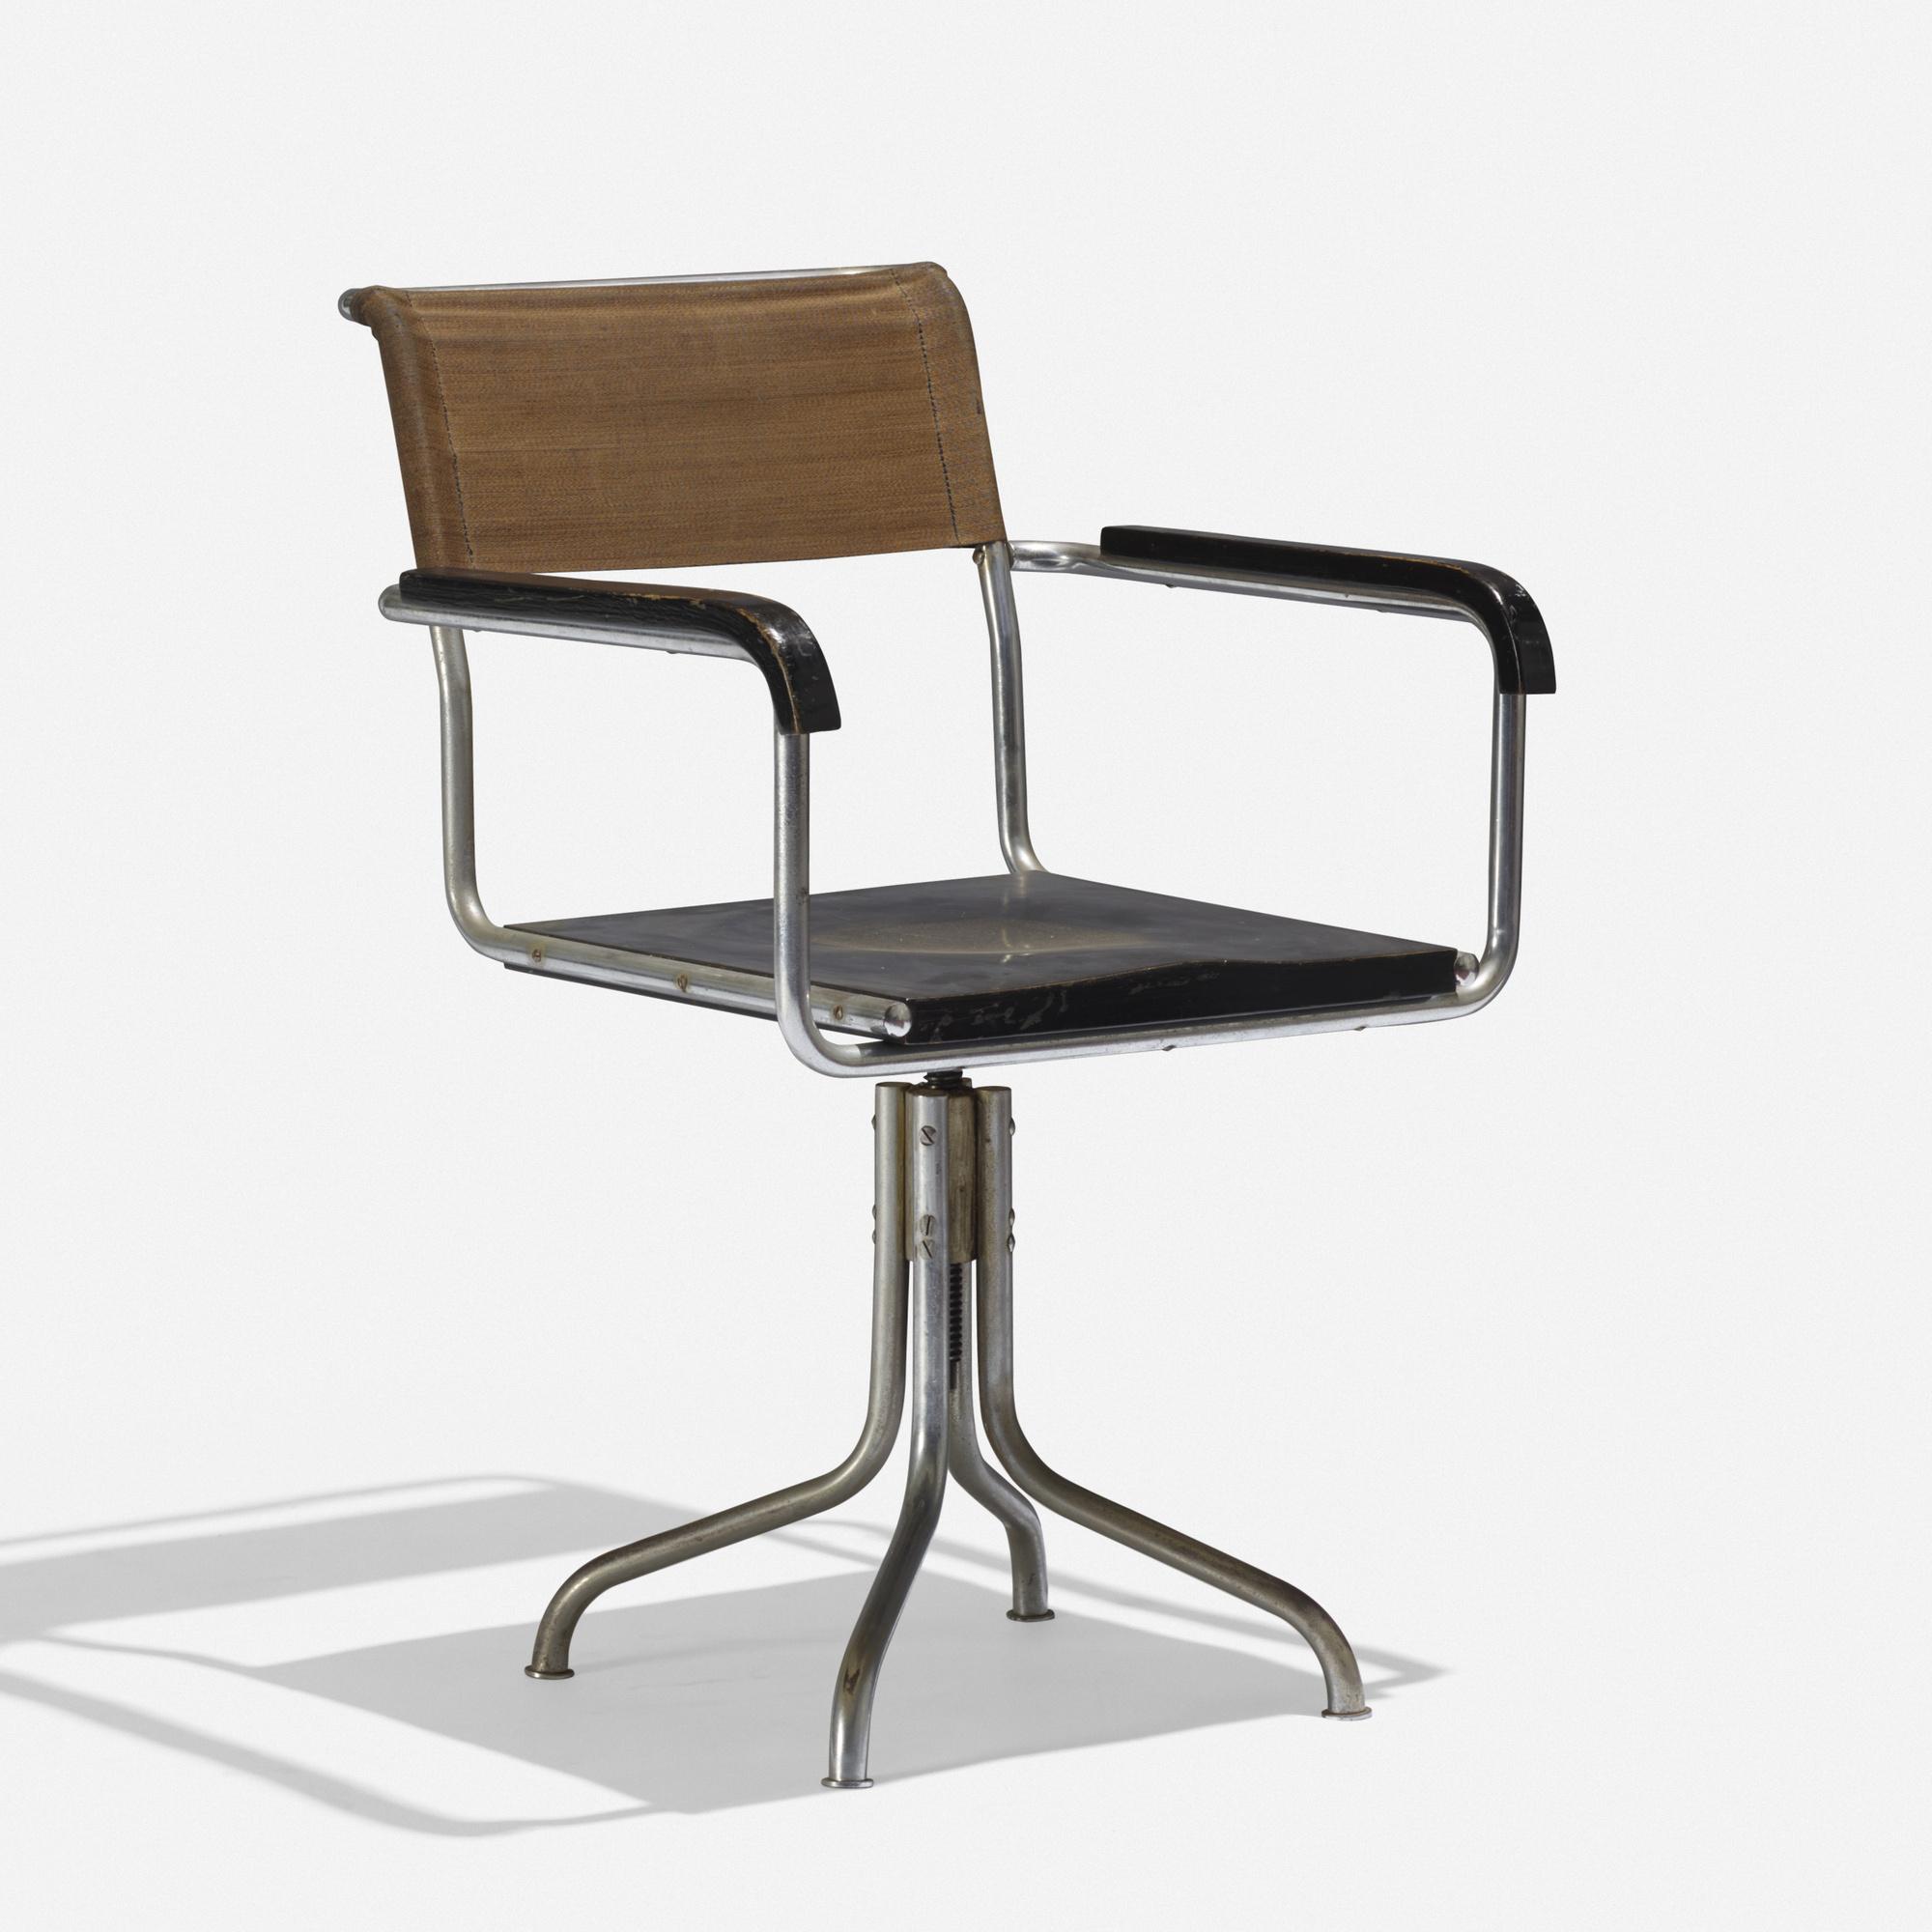 131: MARCEL BREUER, adjustable armchair, model B7A